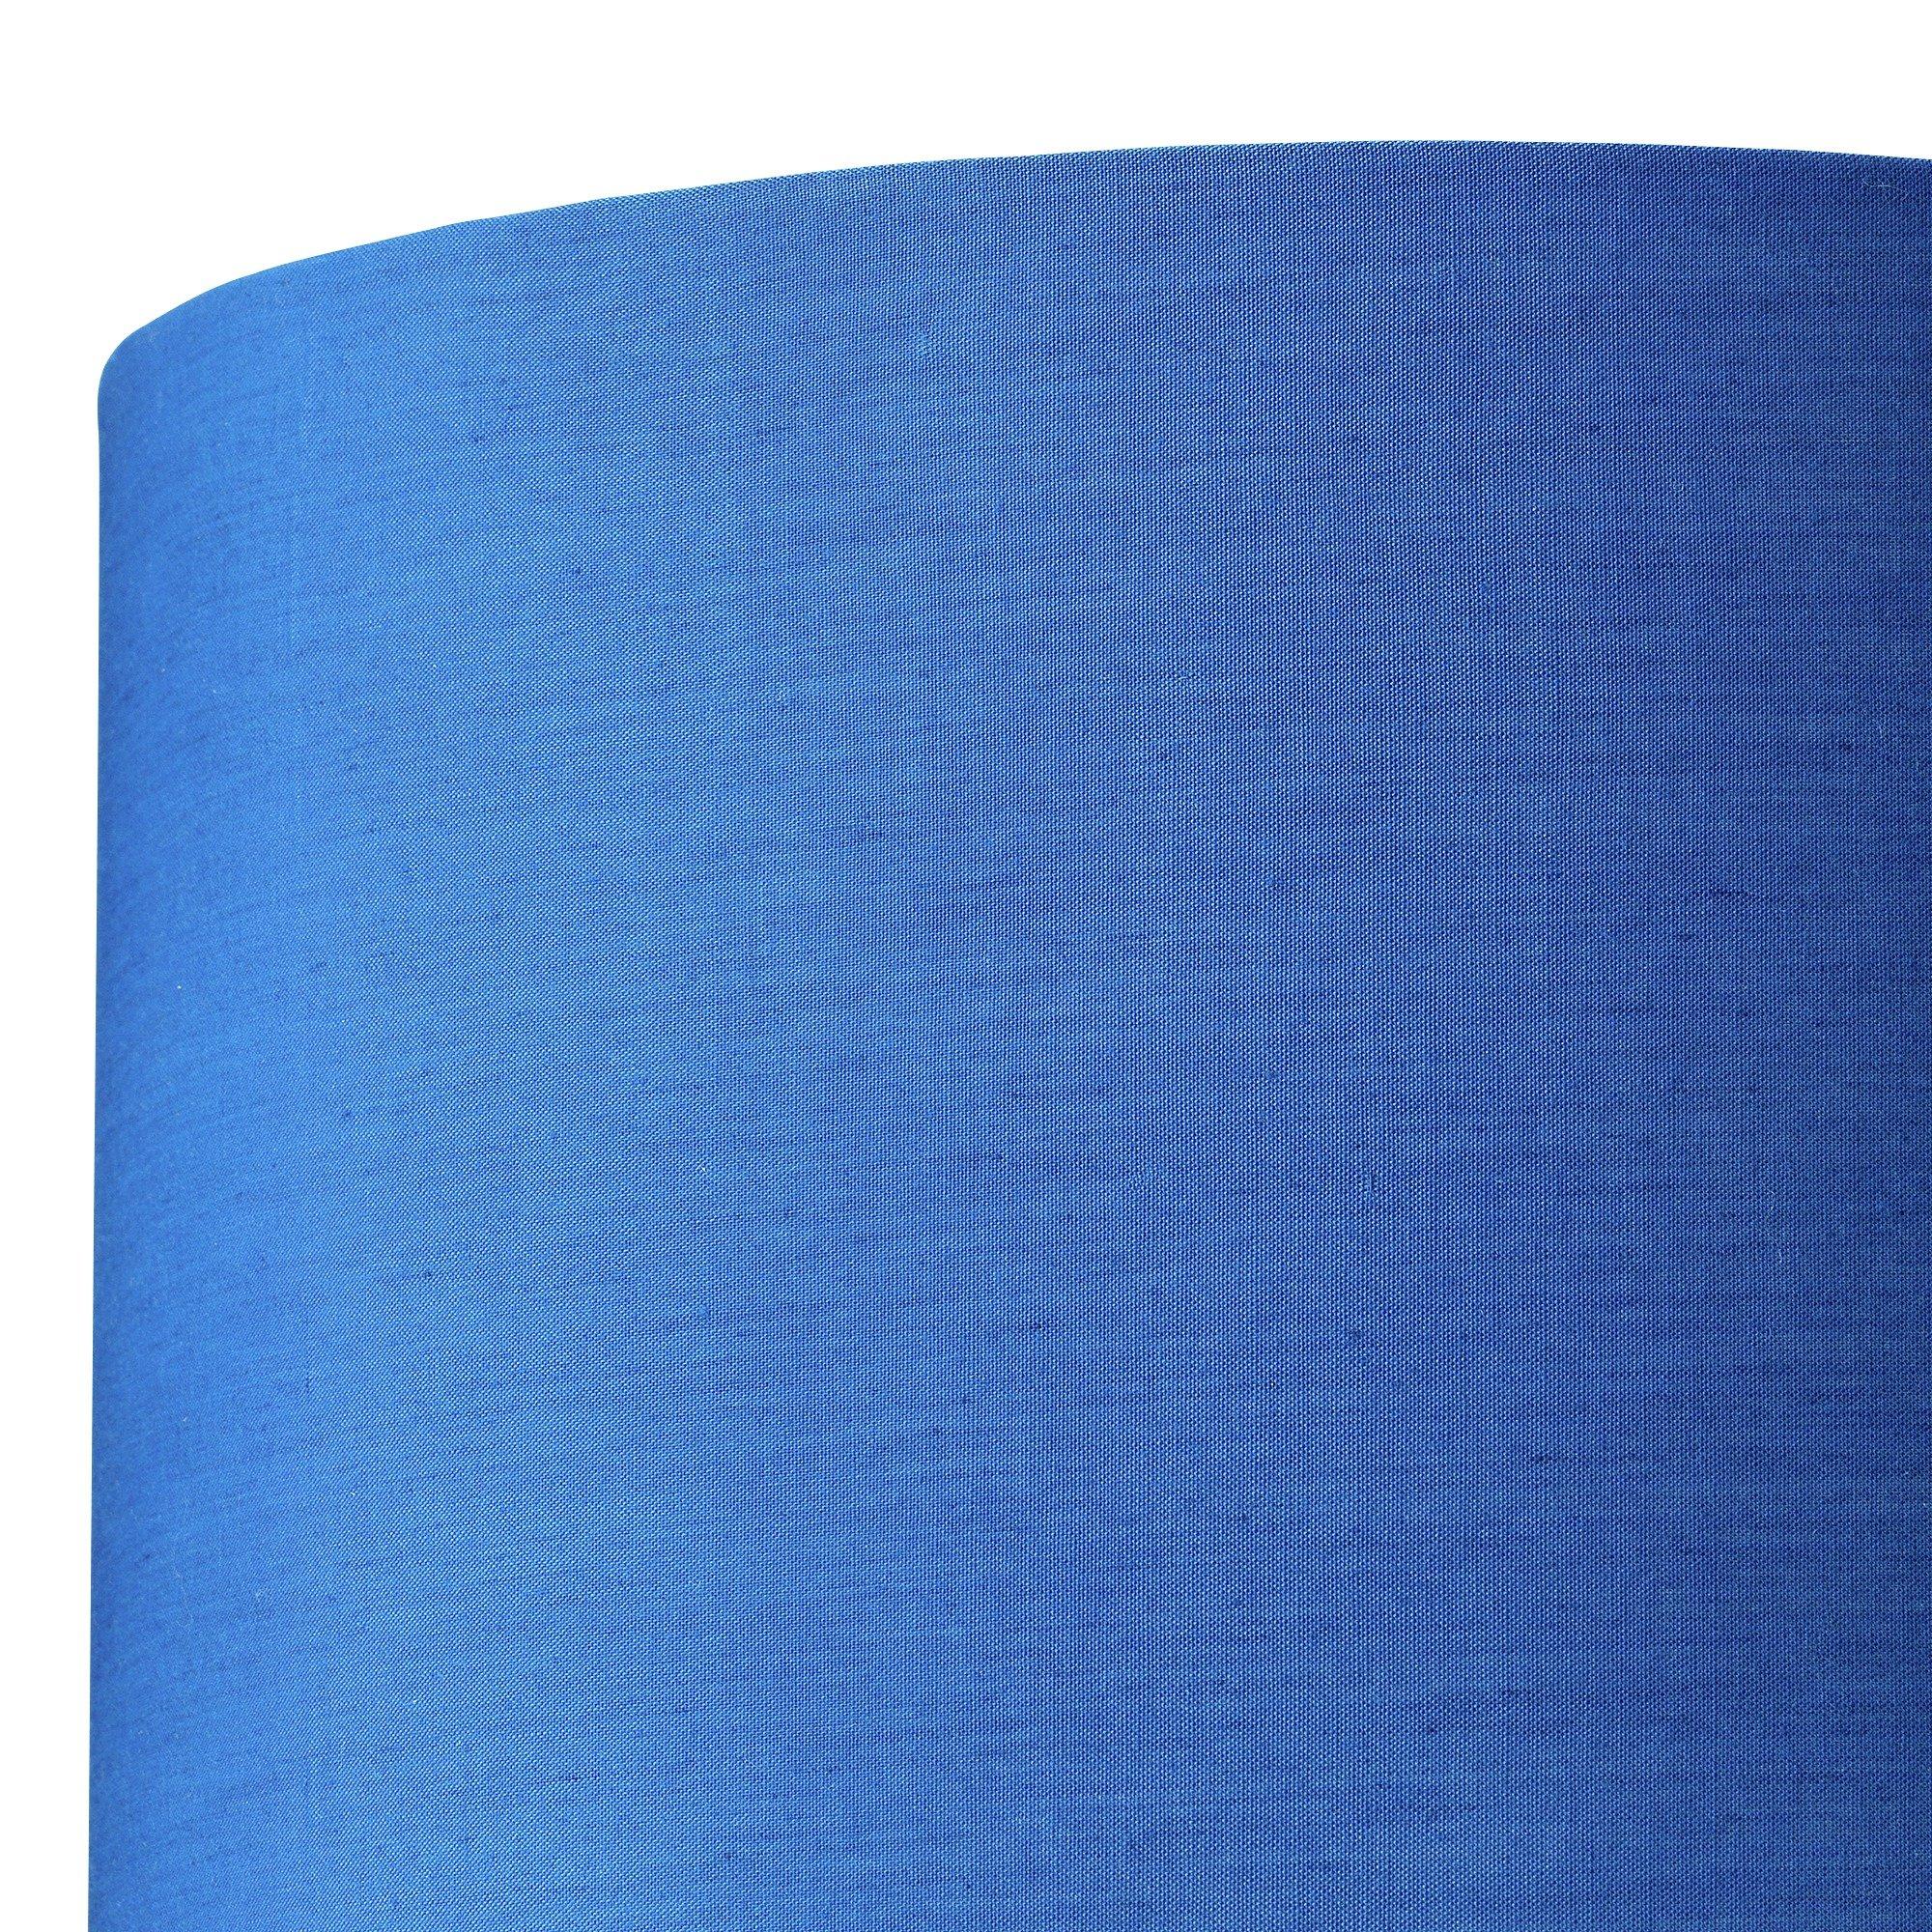 Argos Home Drum Light Shade - Ink Blue